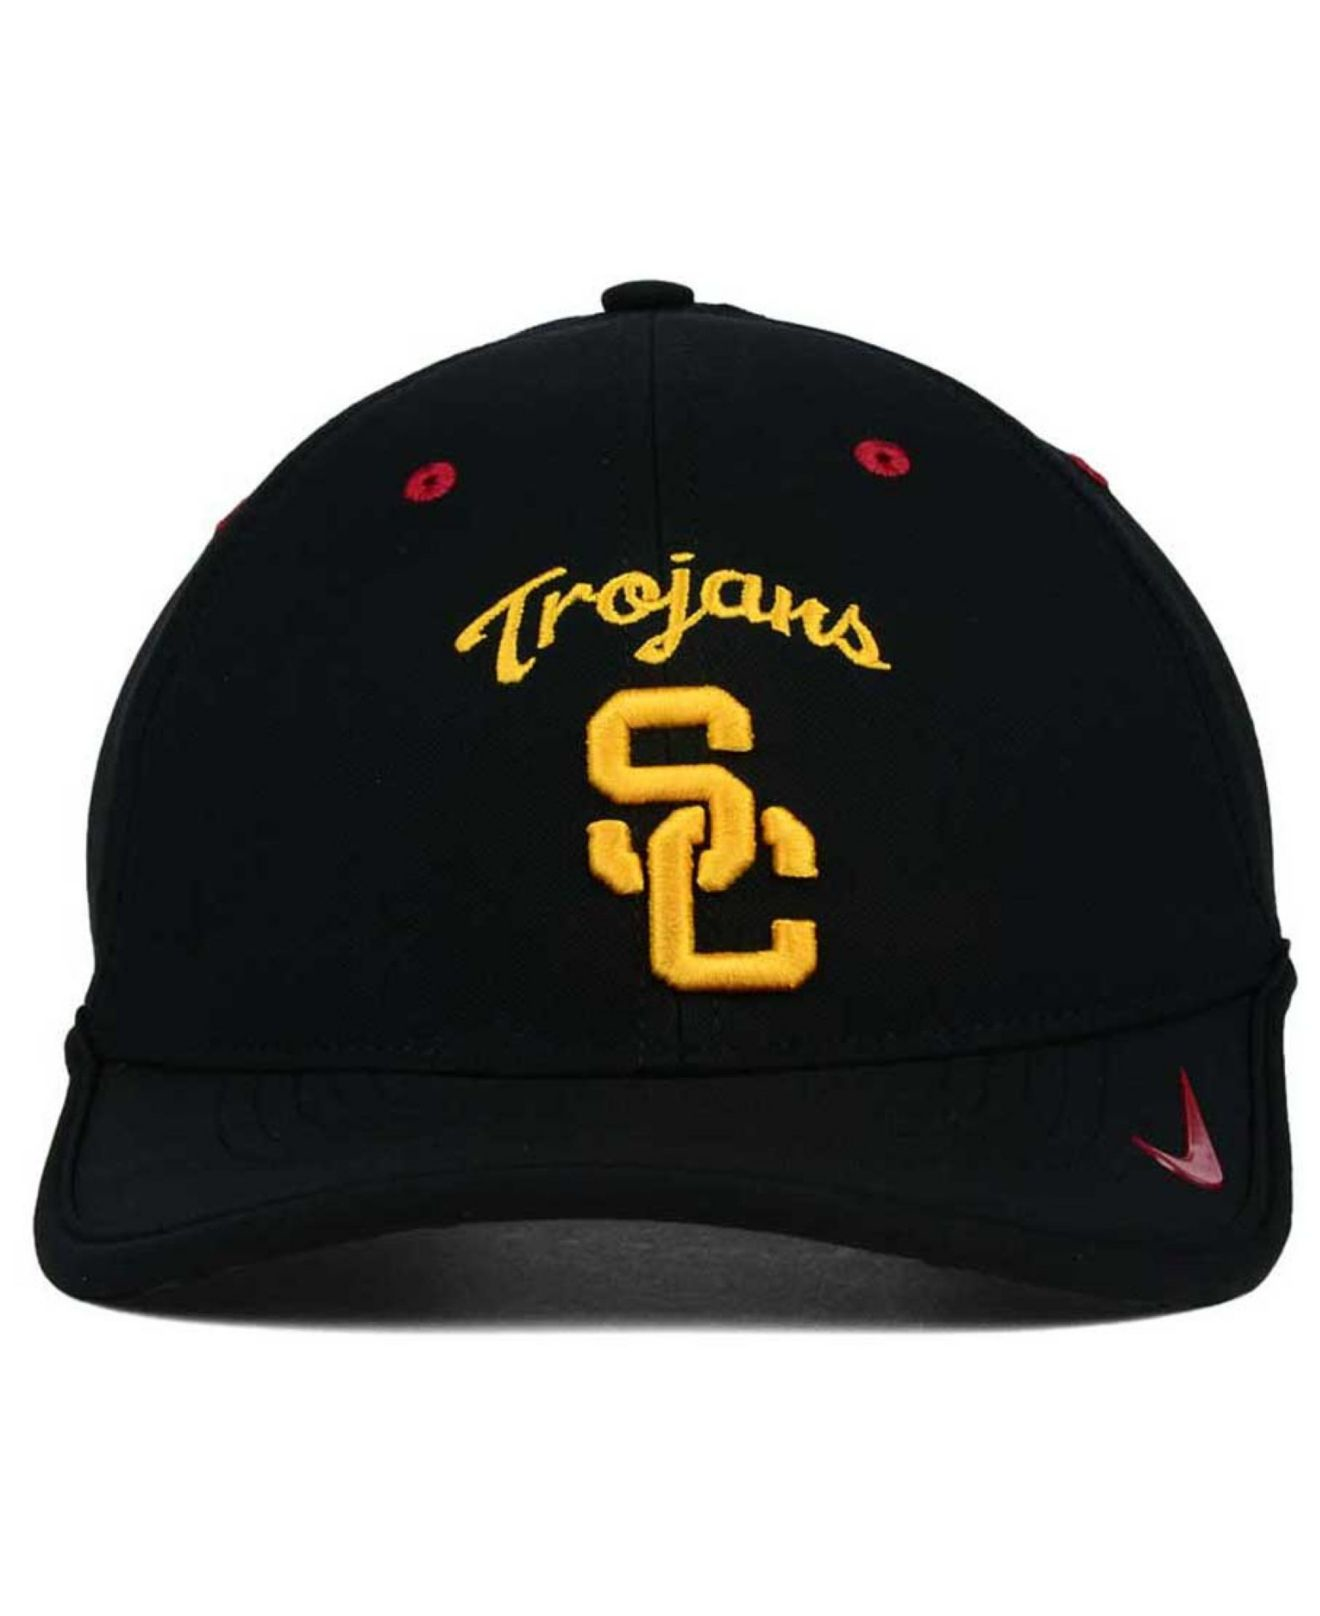 finest selection 33074 4d611 best price lyst nike usc trojans dri fit coaches cap in black for men aad37  d809a